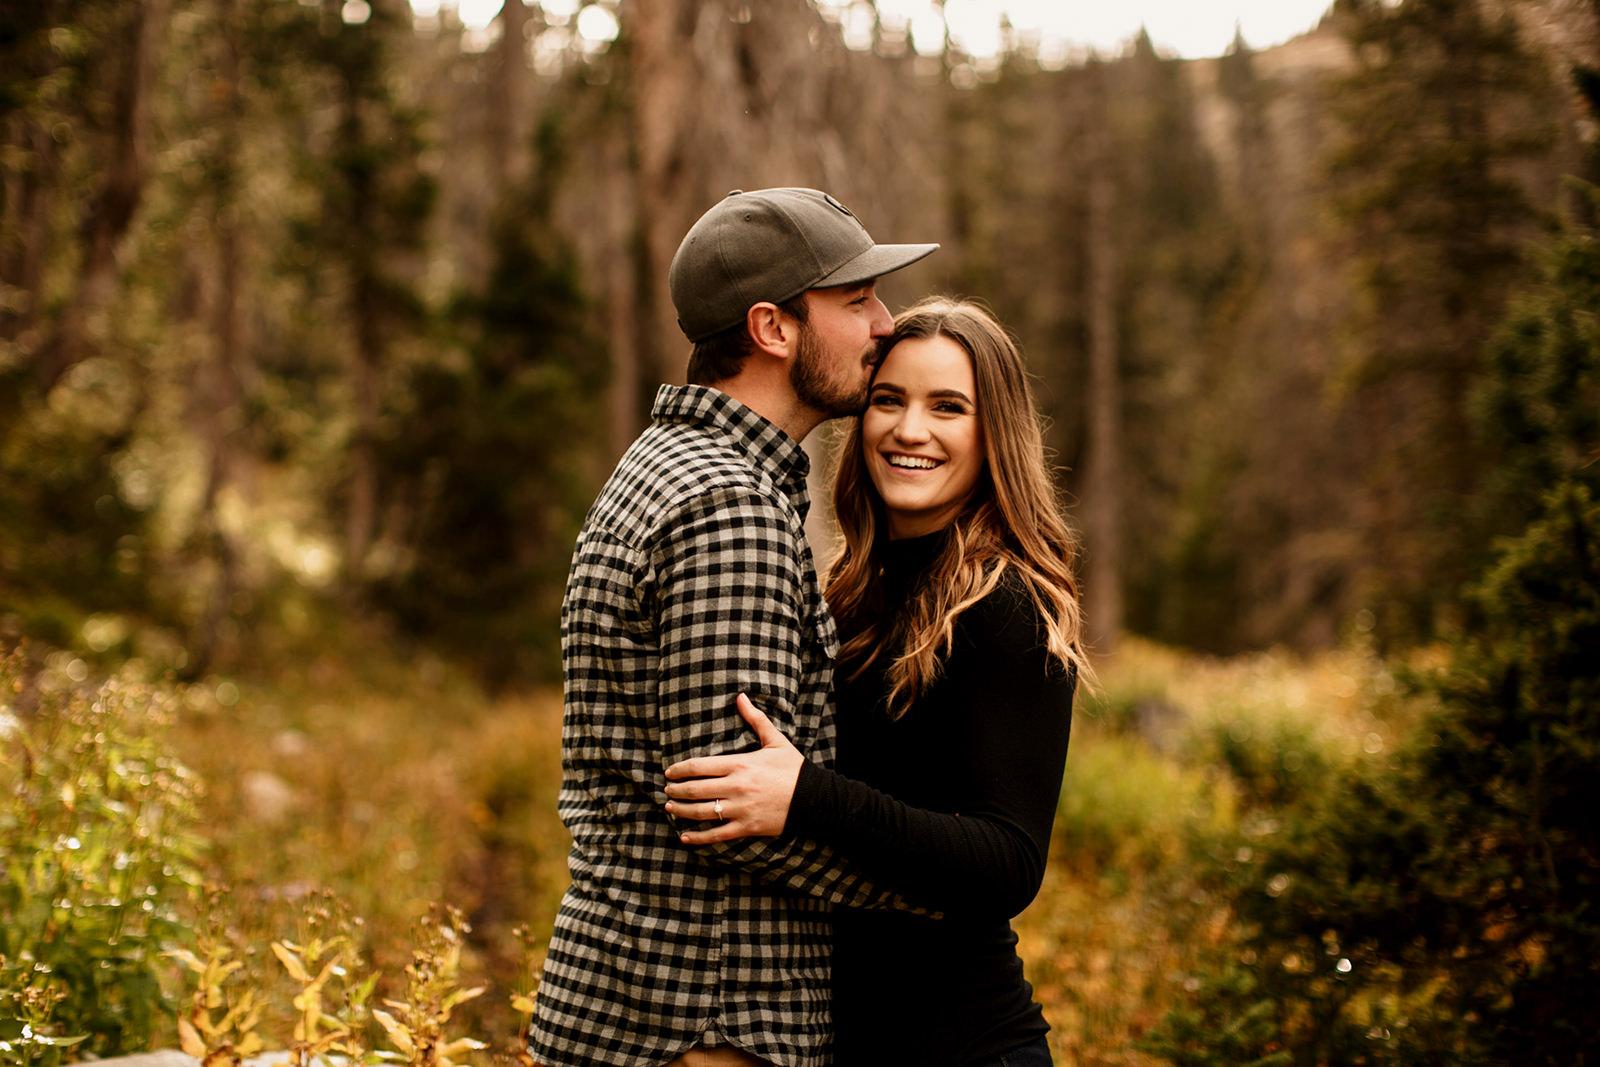 Liz Osban Photography Cheyenne Wyoming Engagement Wedding Photographer couple adventure elopement wedding laramie denver fort collins colorado rocky mountain national park1.jpg